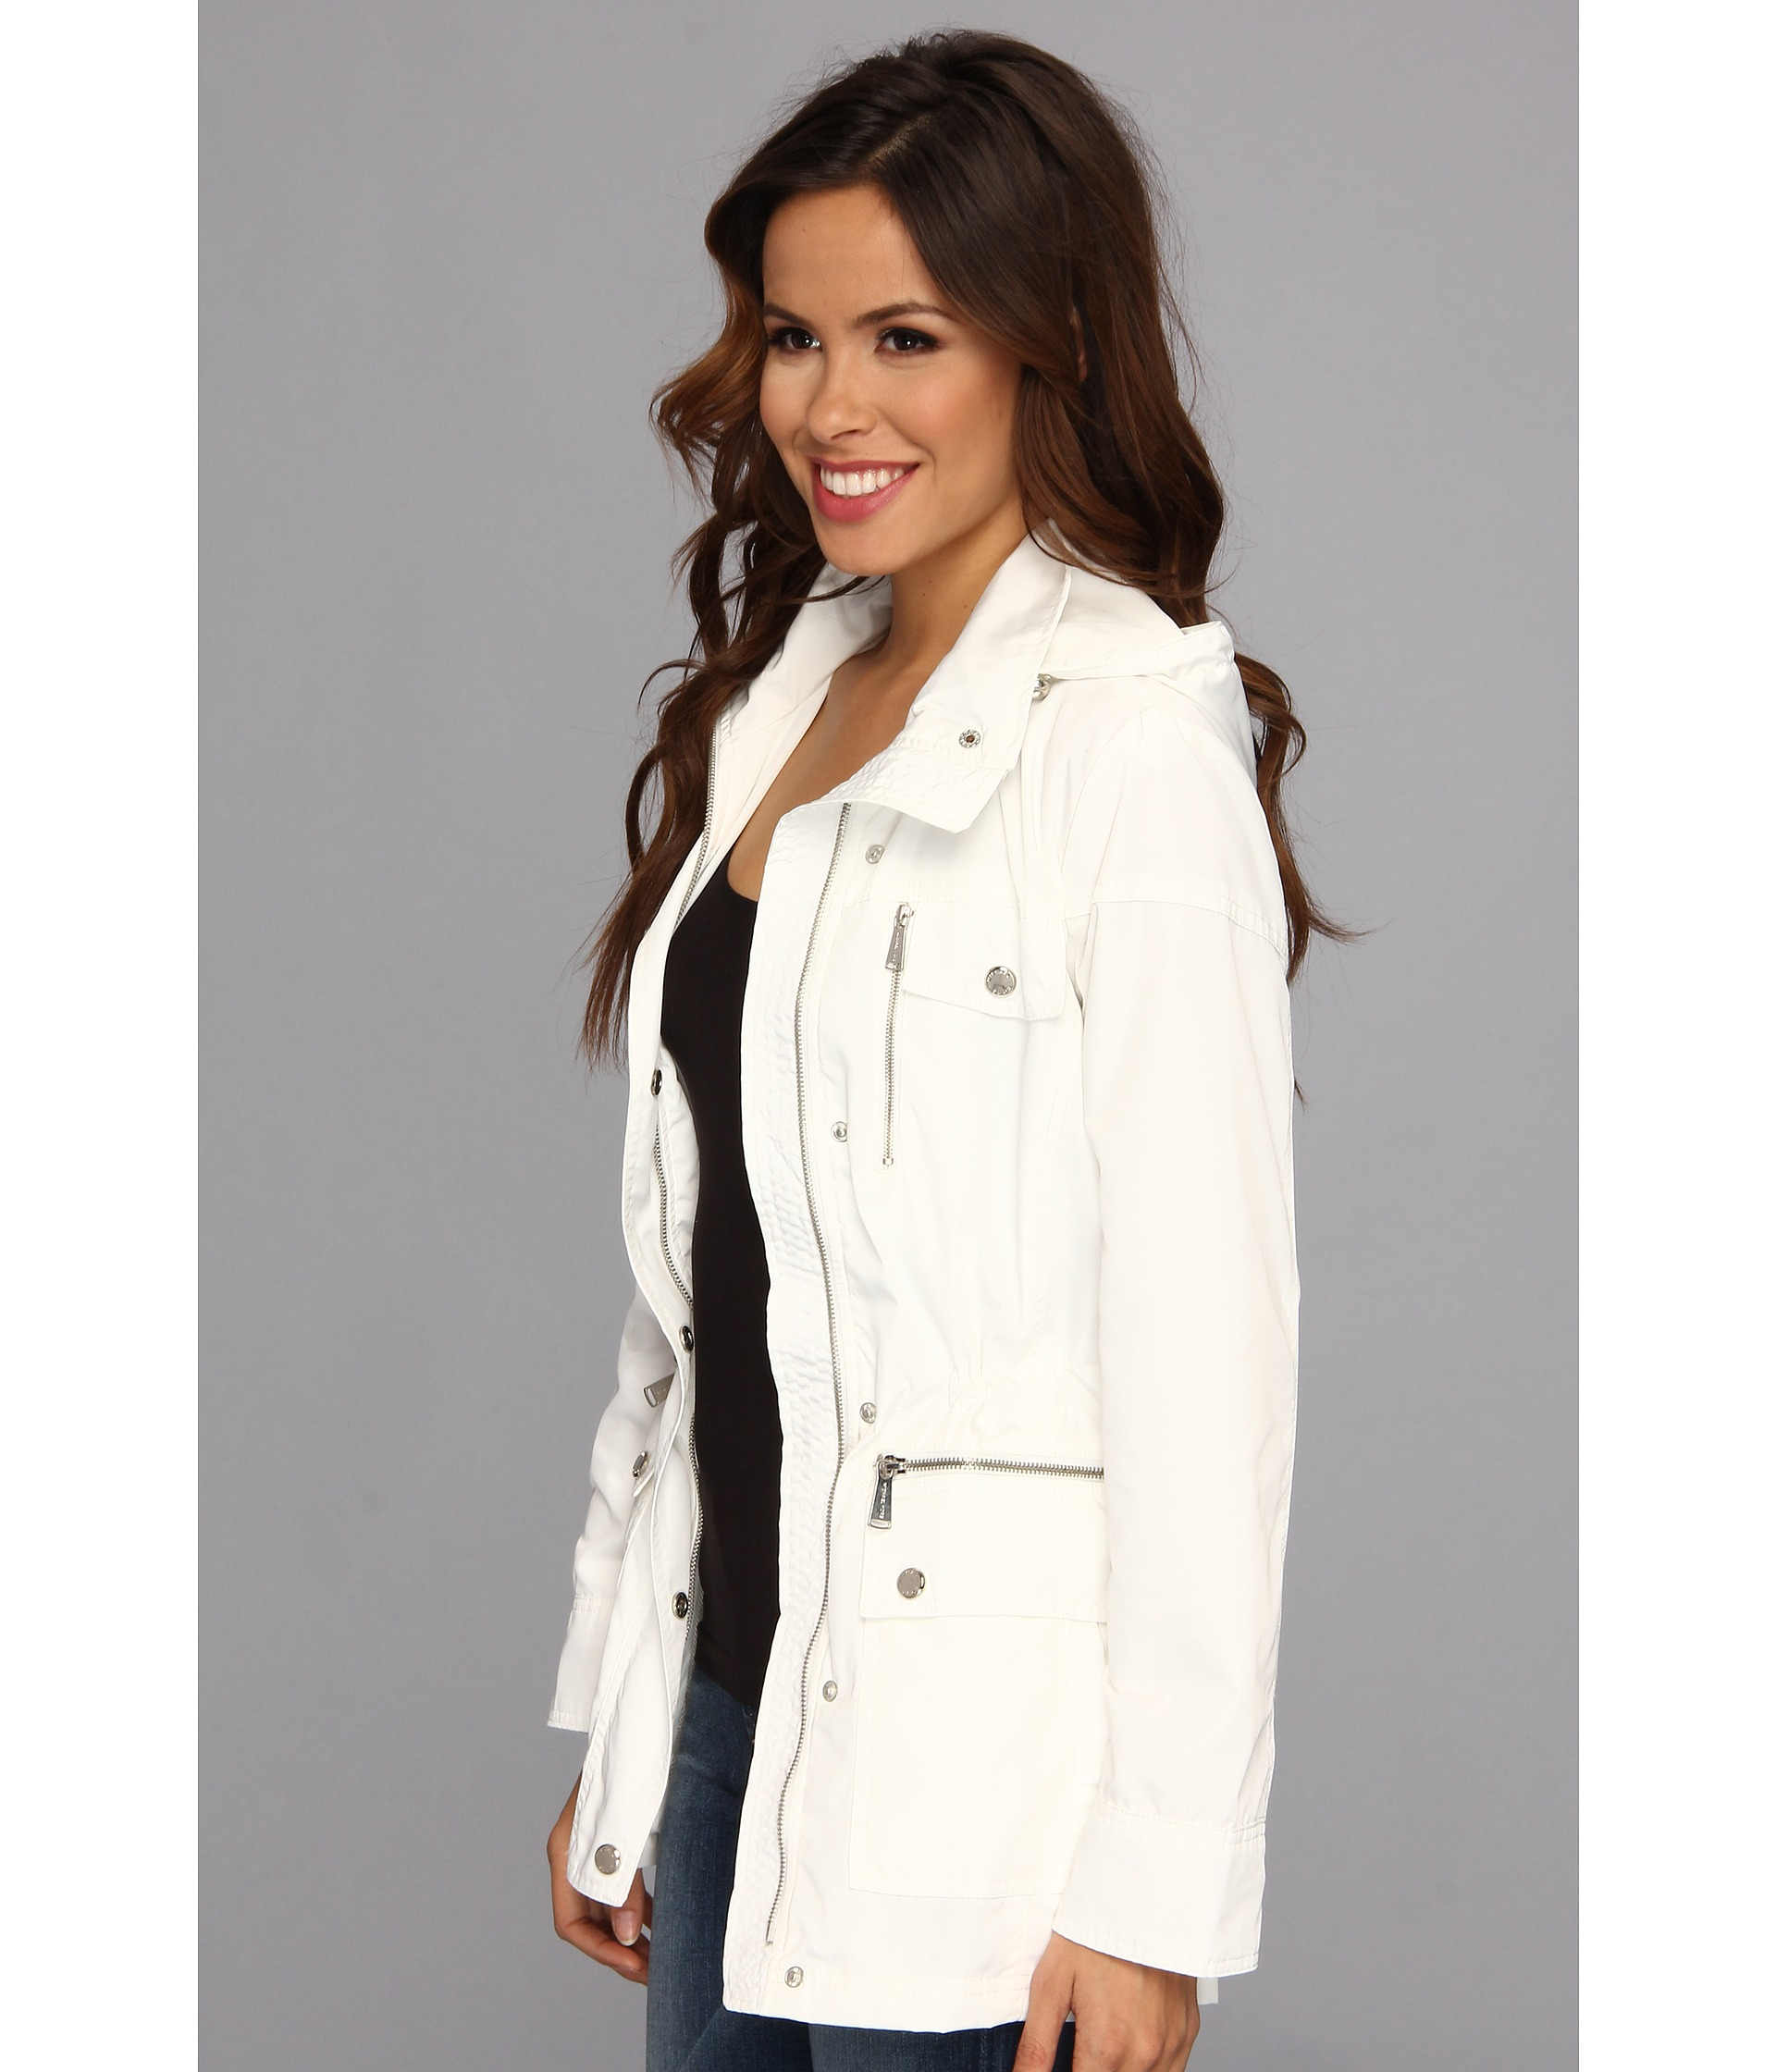 Michael kors womens white coat